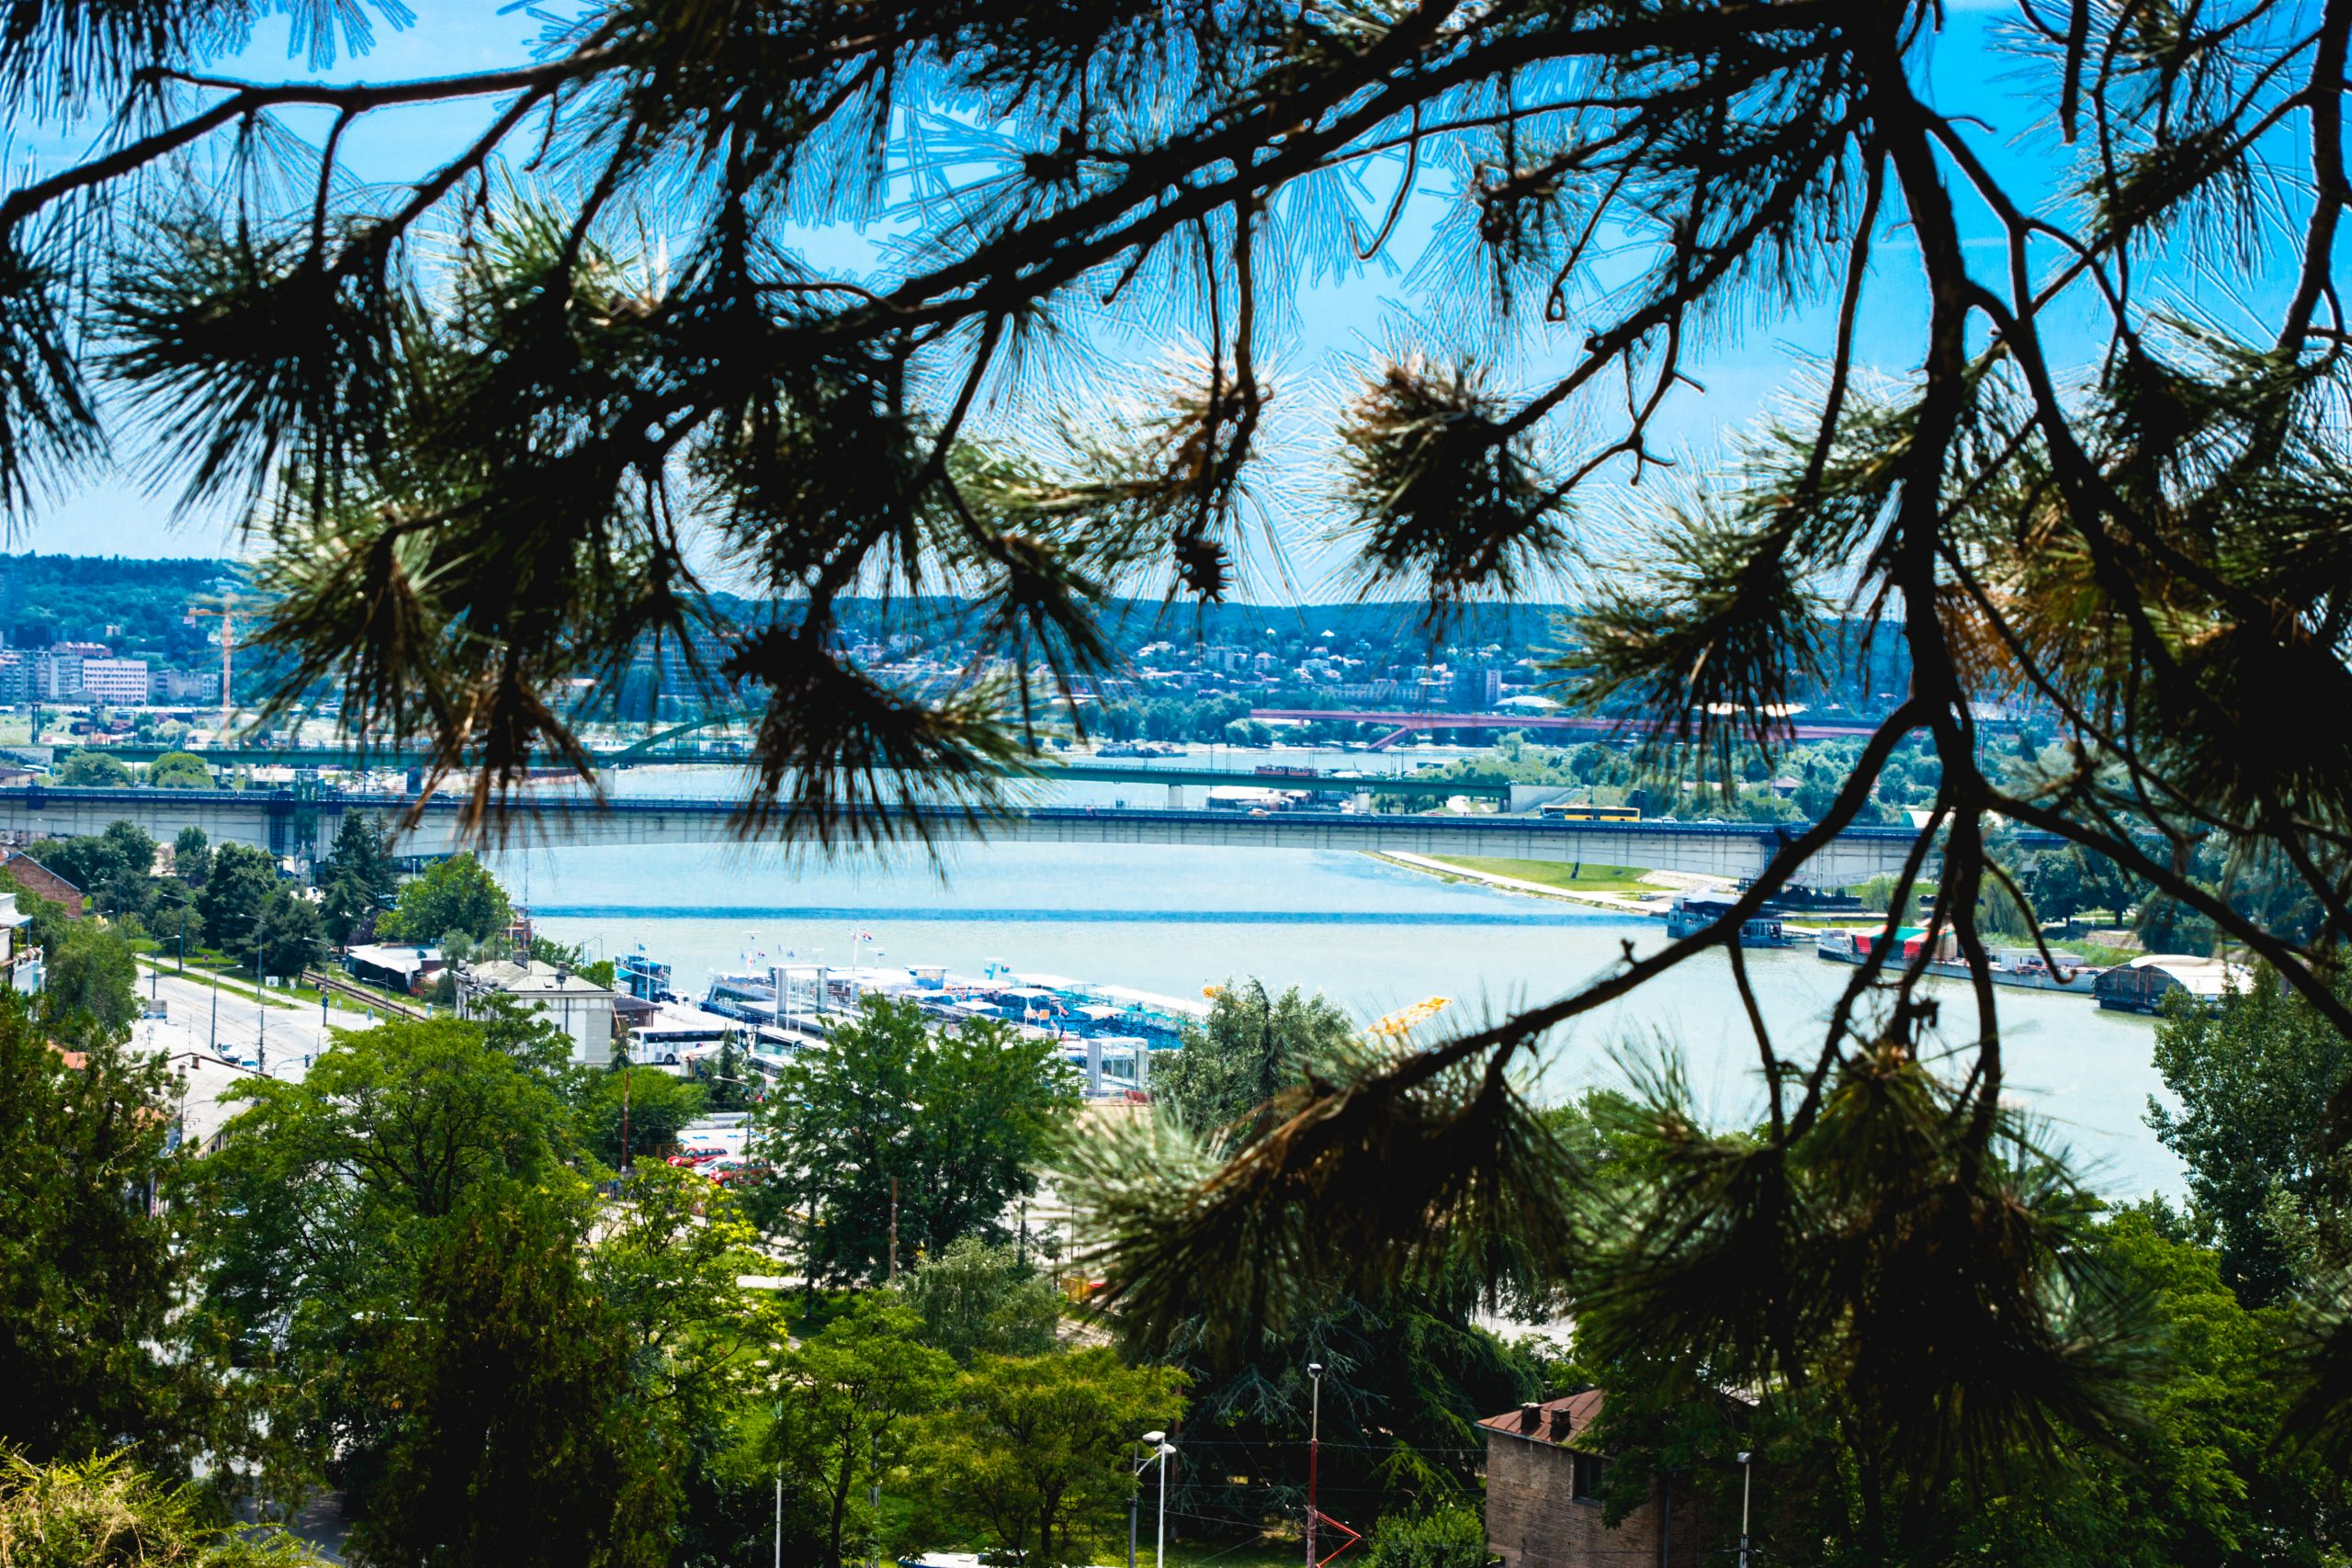 Sedam dana u Beogradu (6-12. jul 2017); foto: Shutterstock